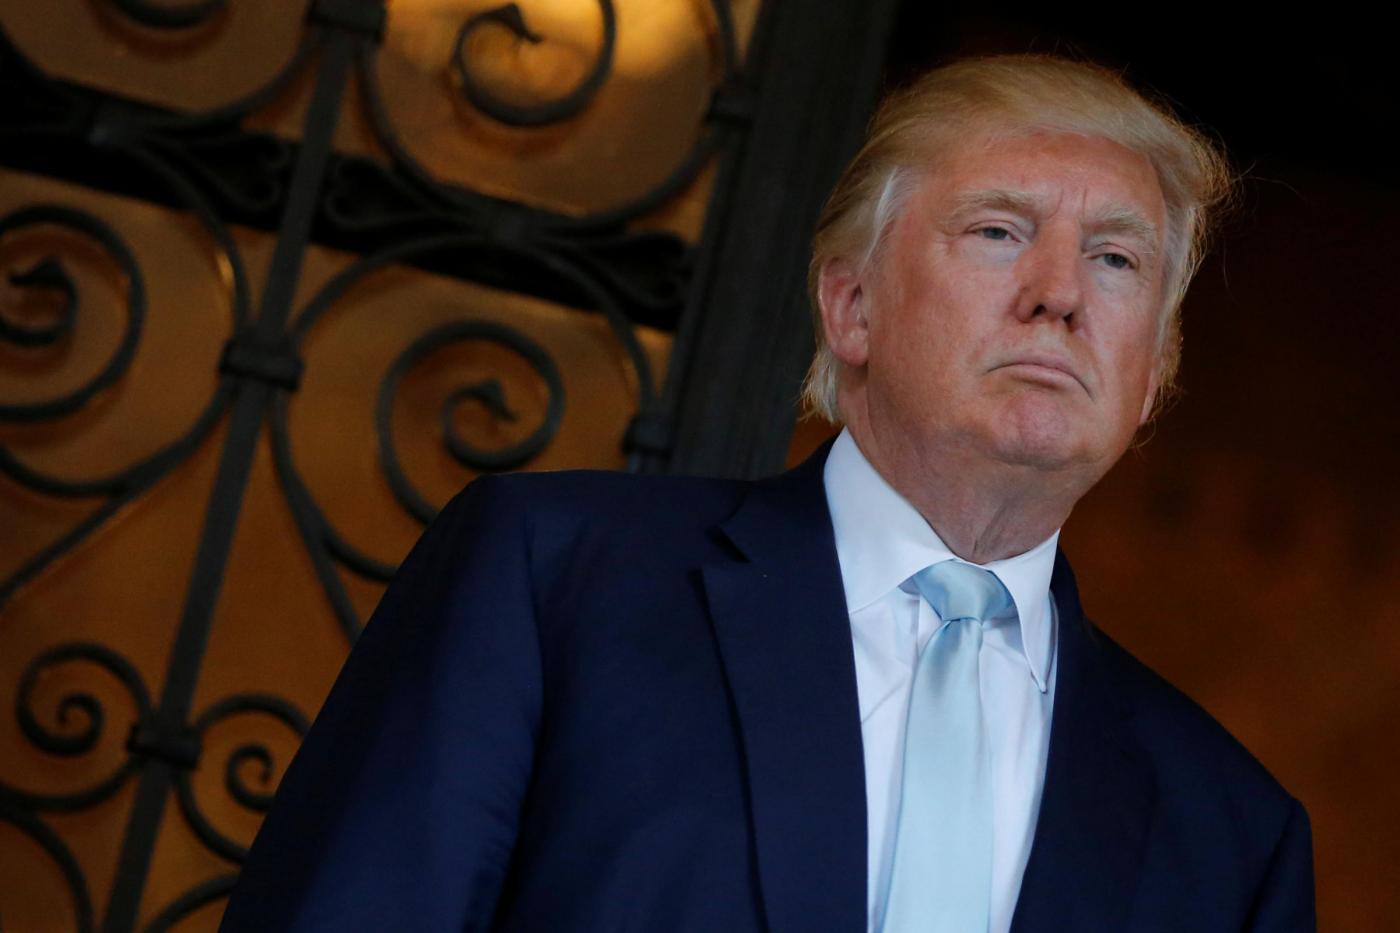 Trump improvvisa conferenza con promoter di boxe Don King